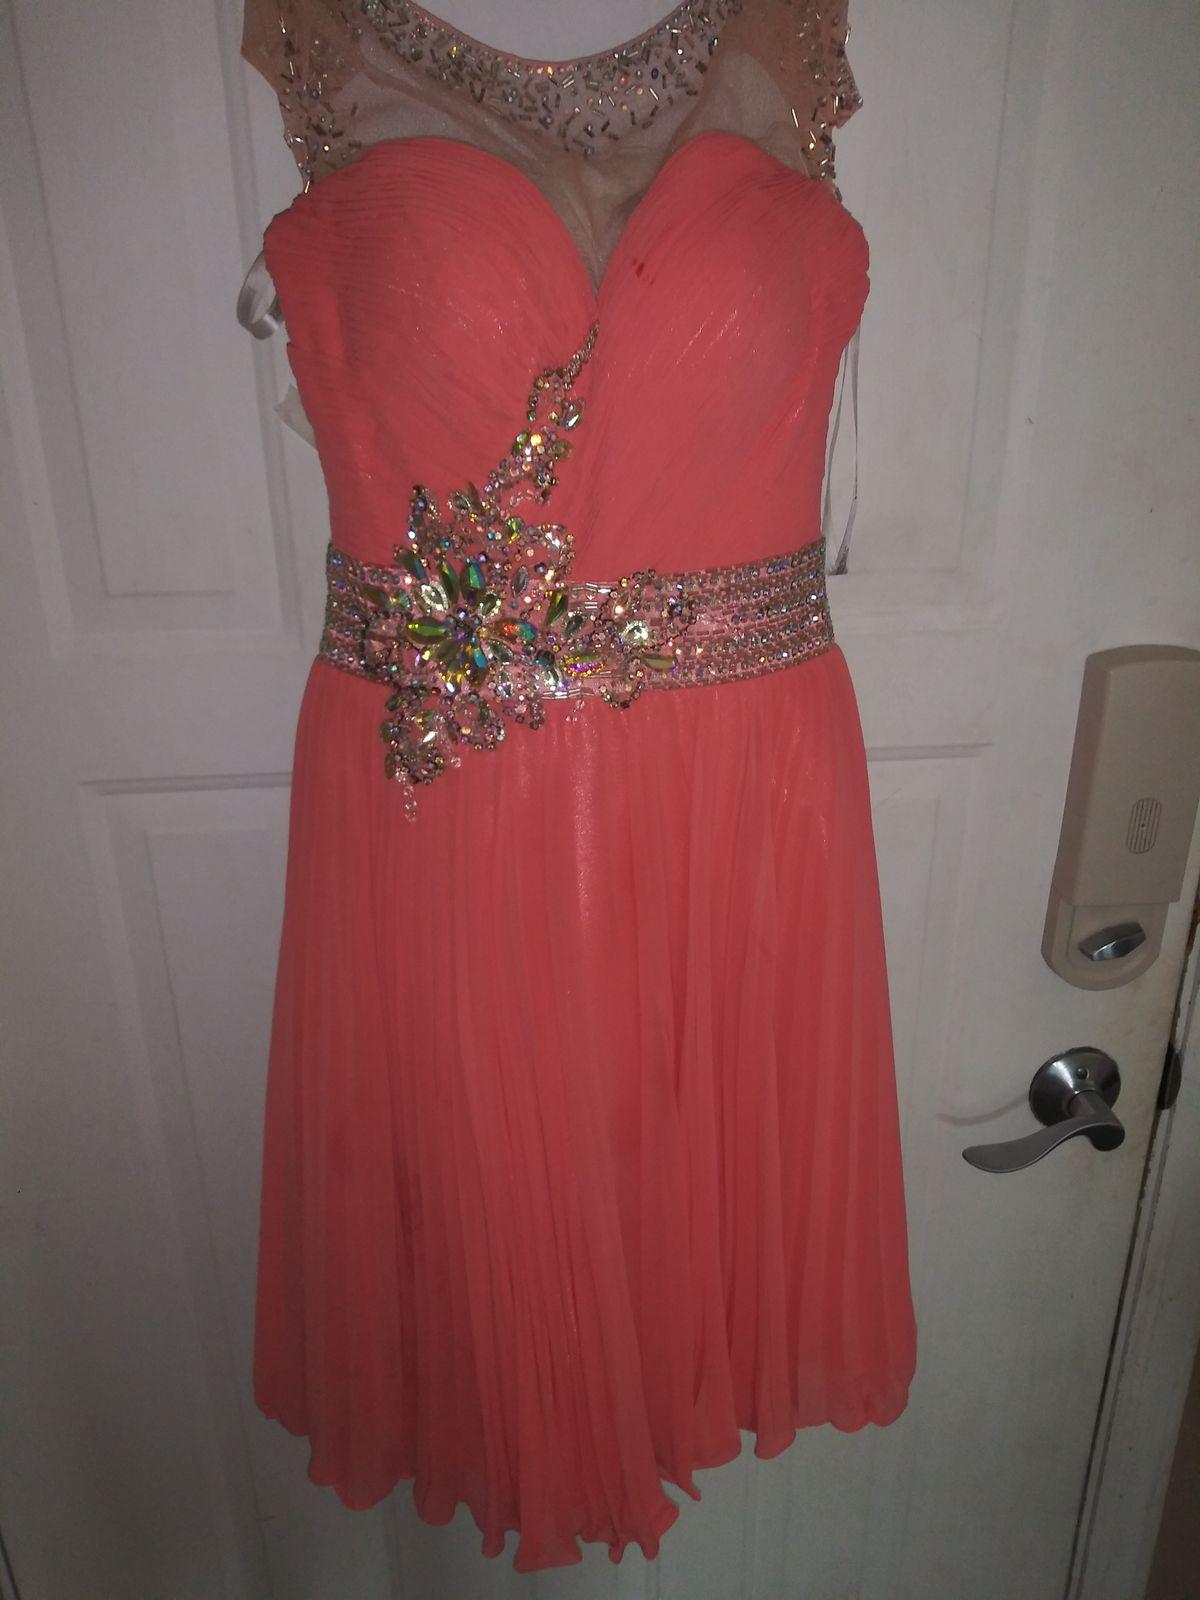 Sherri Hill Orange Size 0 Cocktail Dress on Queenly